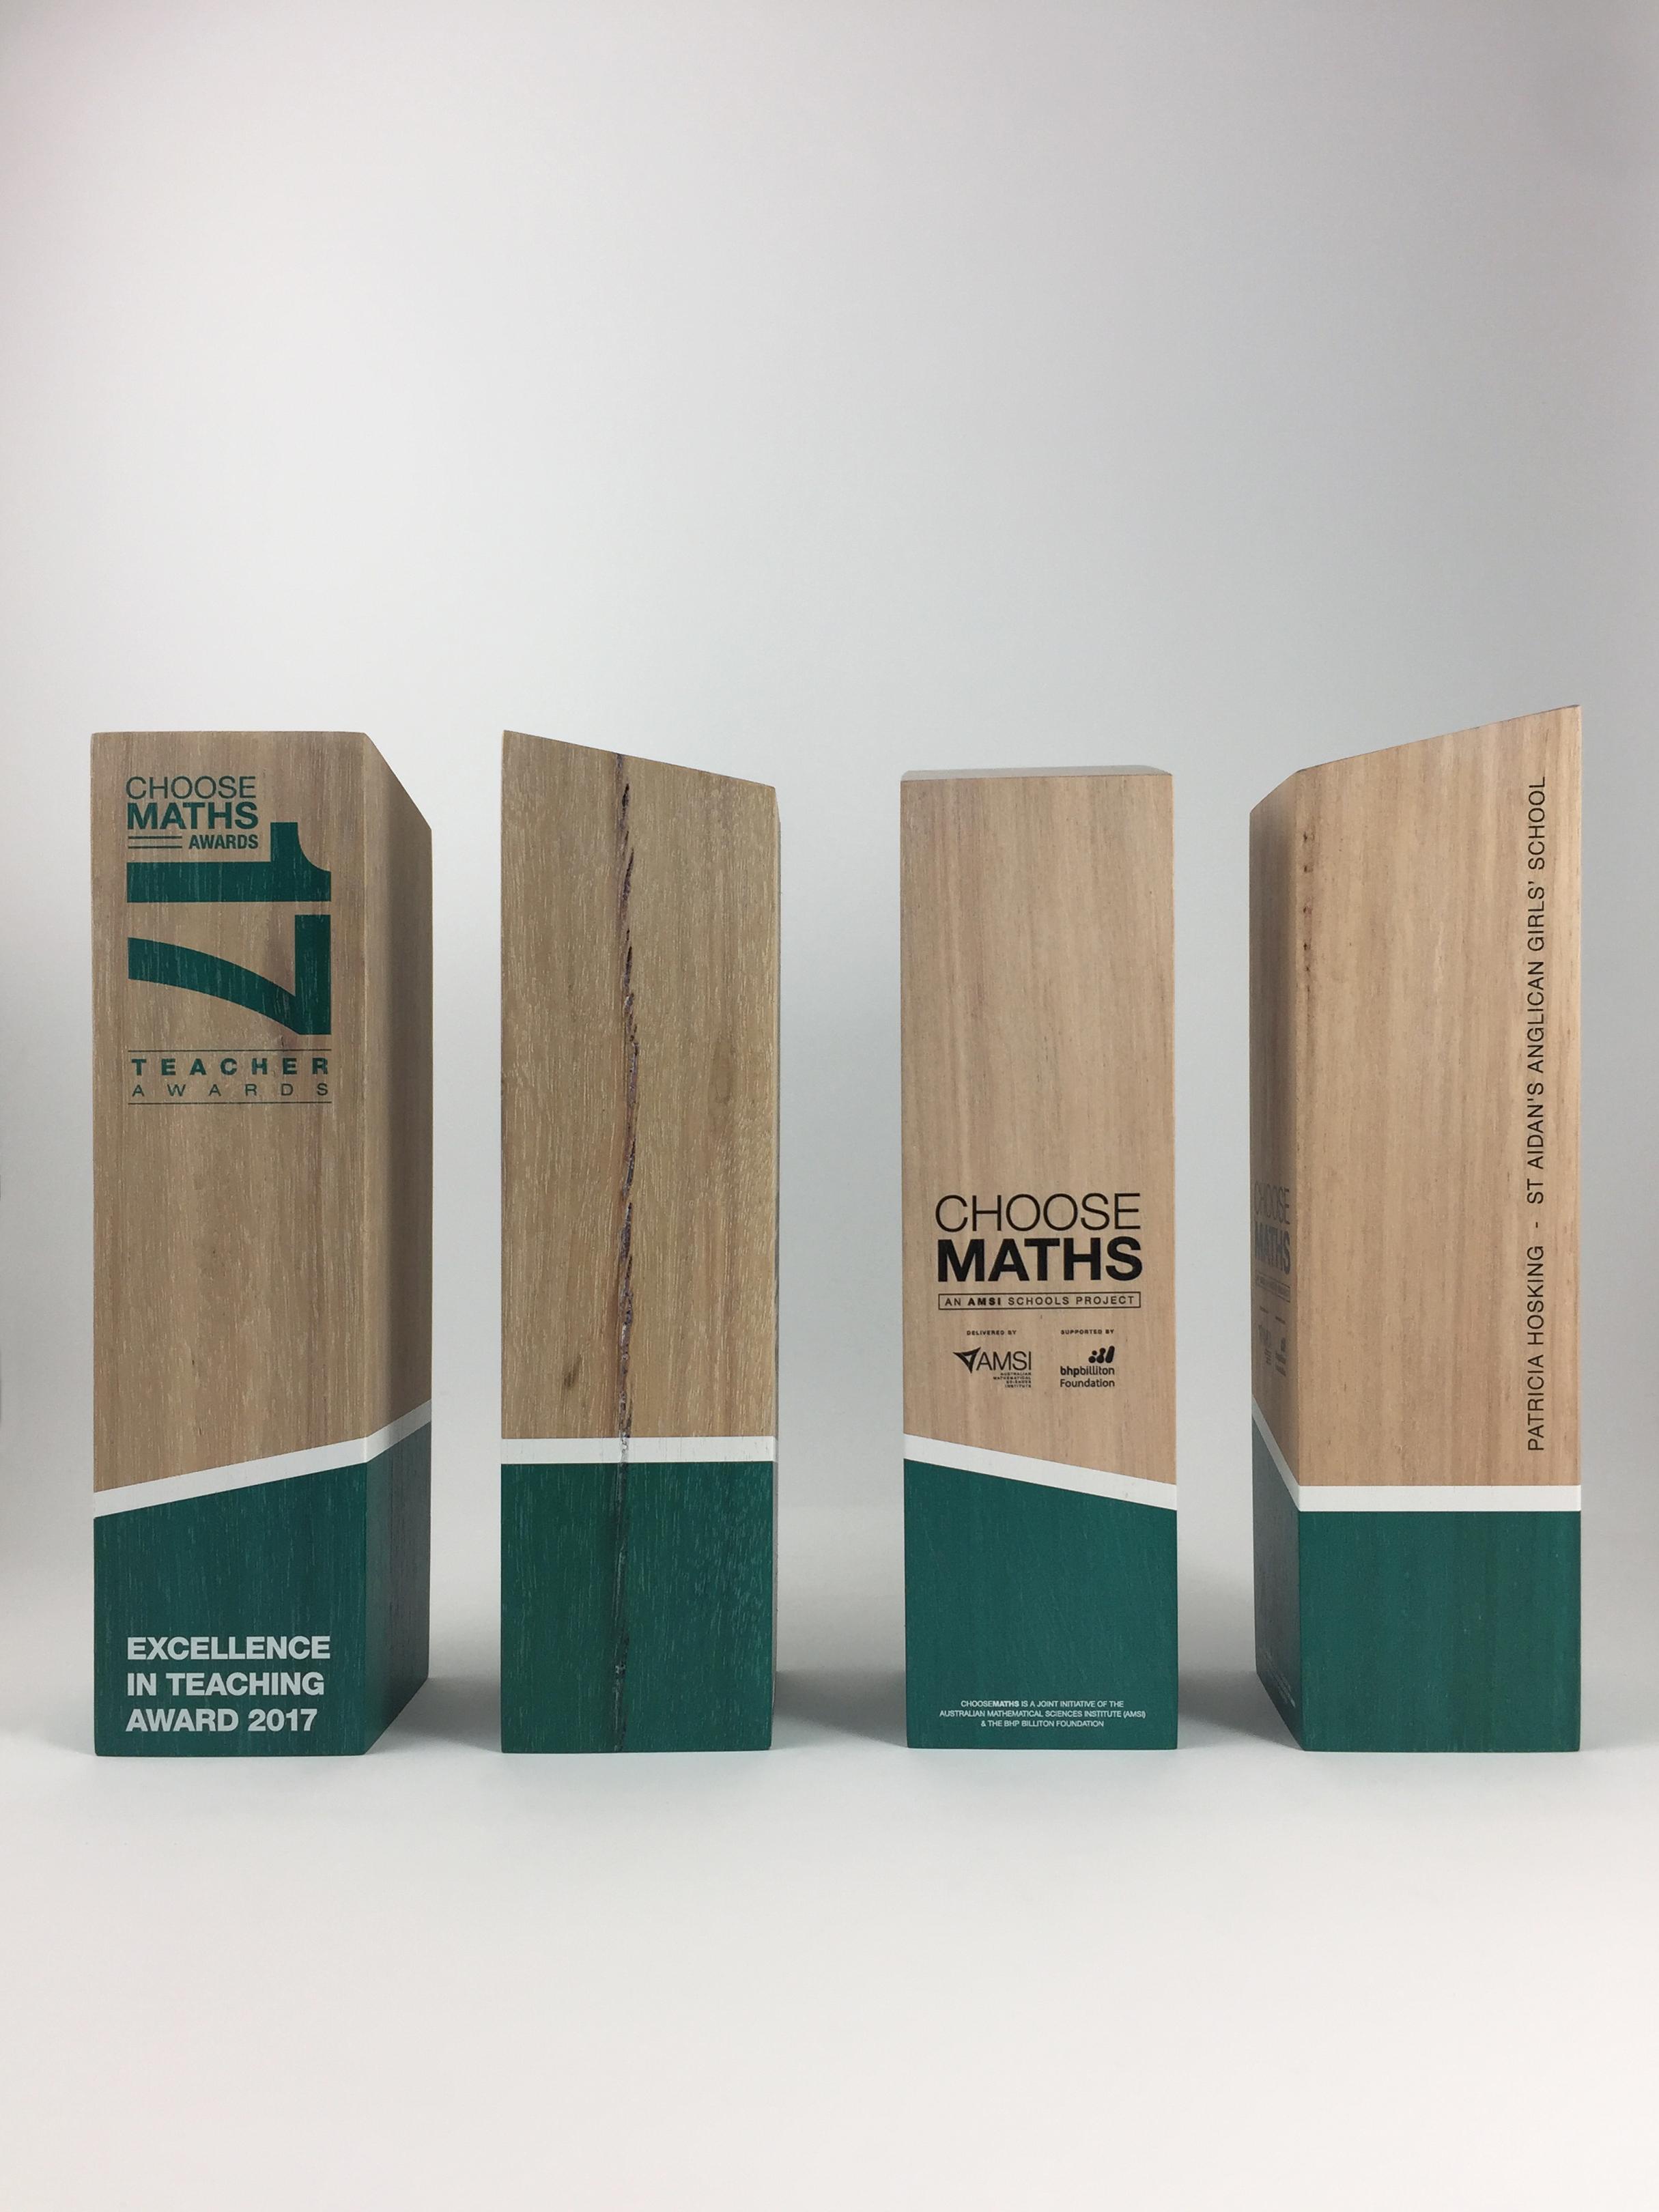 choose-maths-eco-timber-trophy-awards-05.jpg